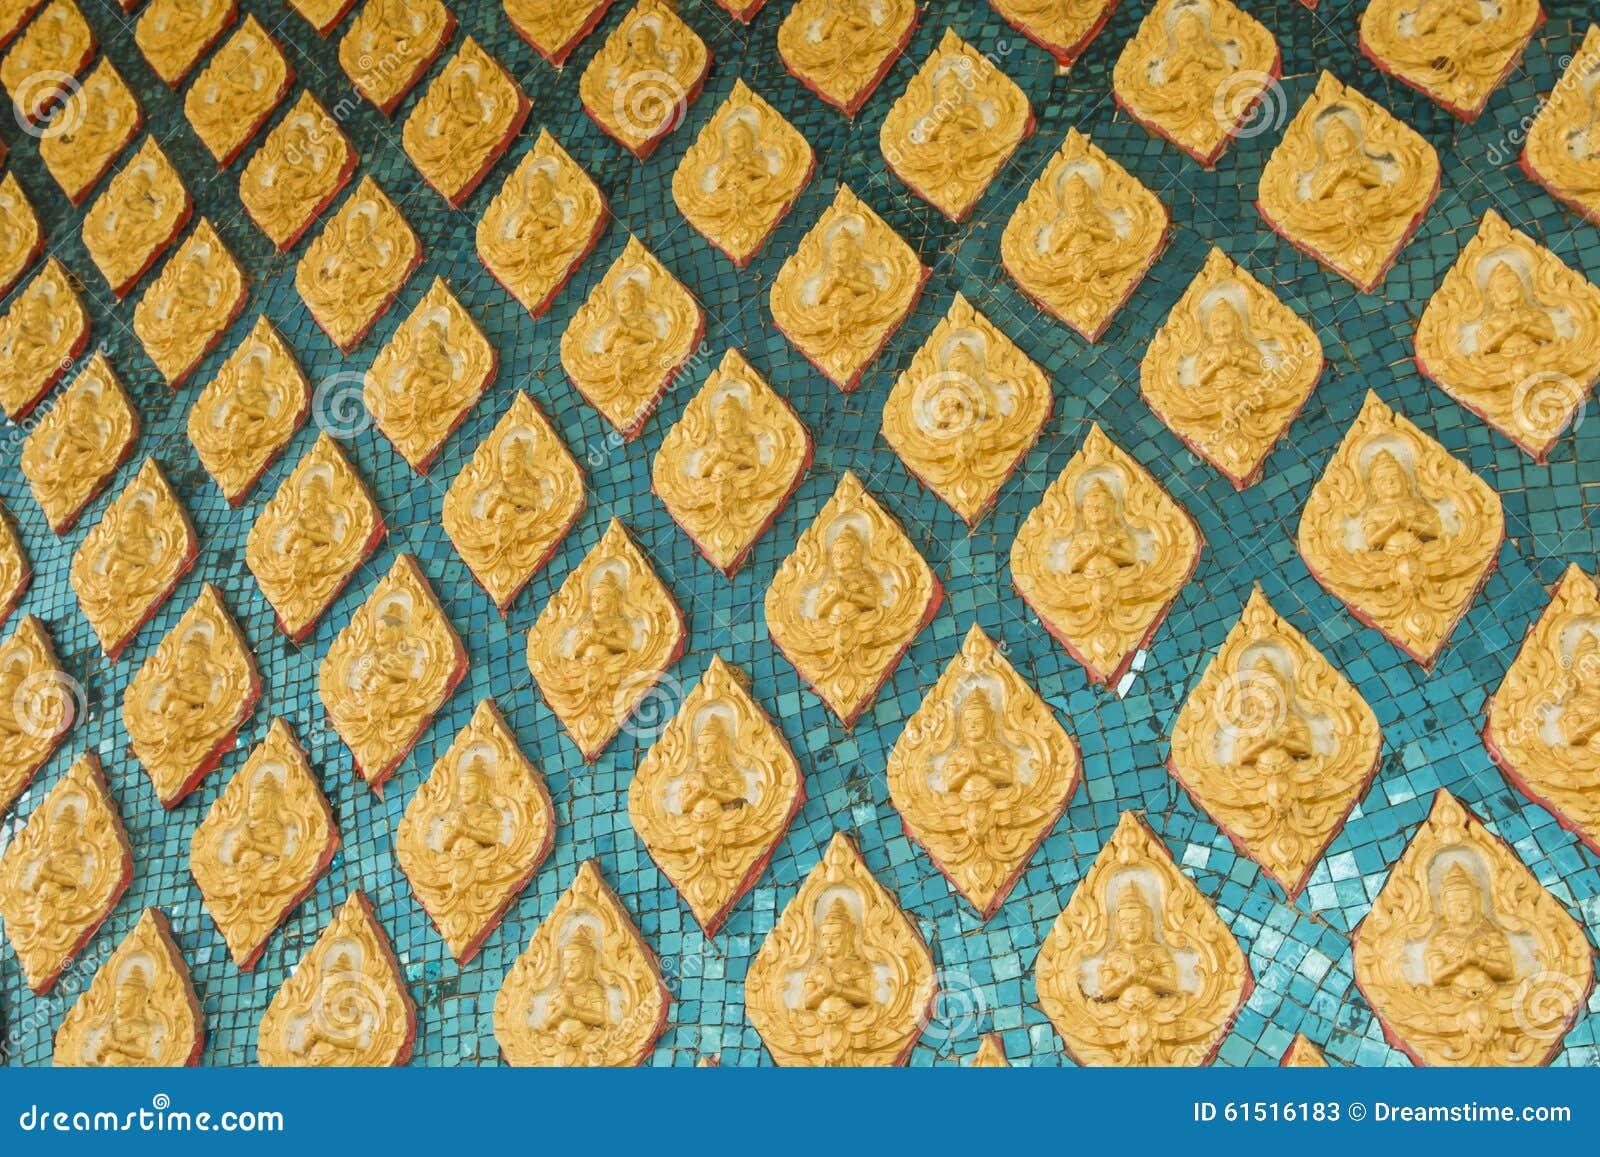 Thai Temple Wall Art Design Stock Image - Image of asian, close ...